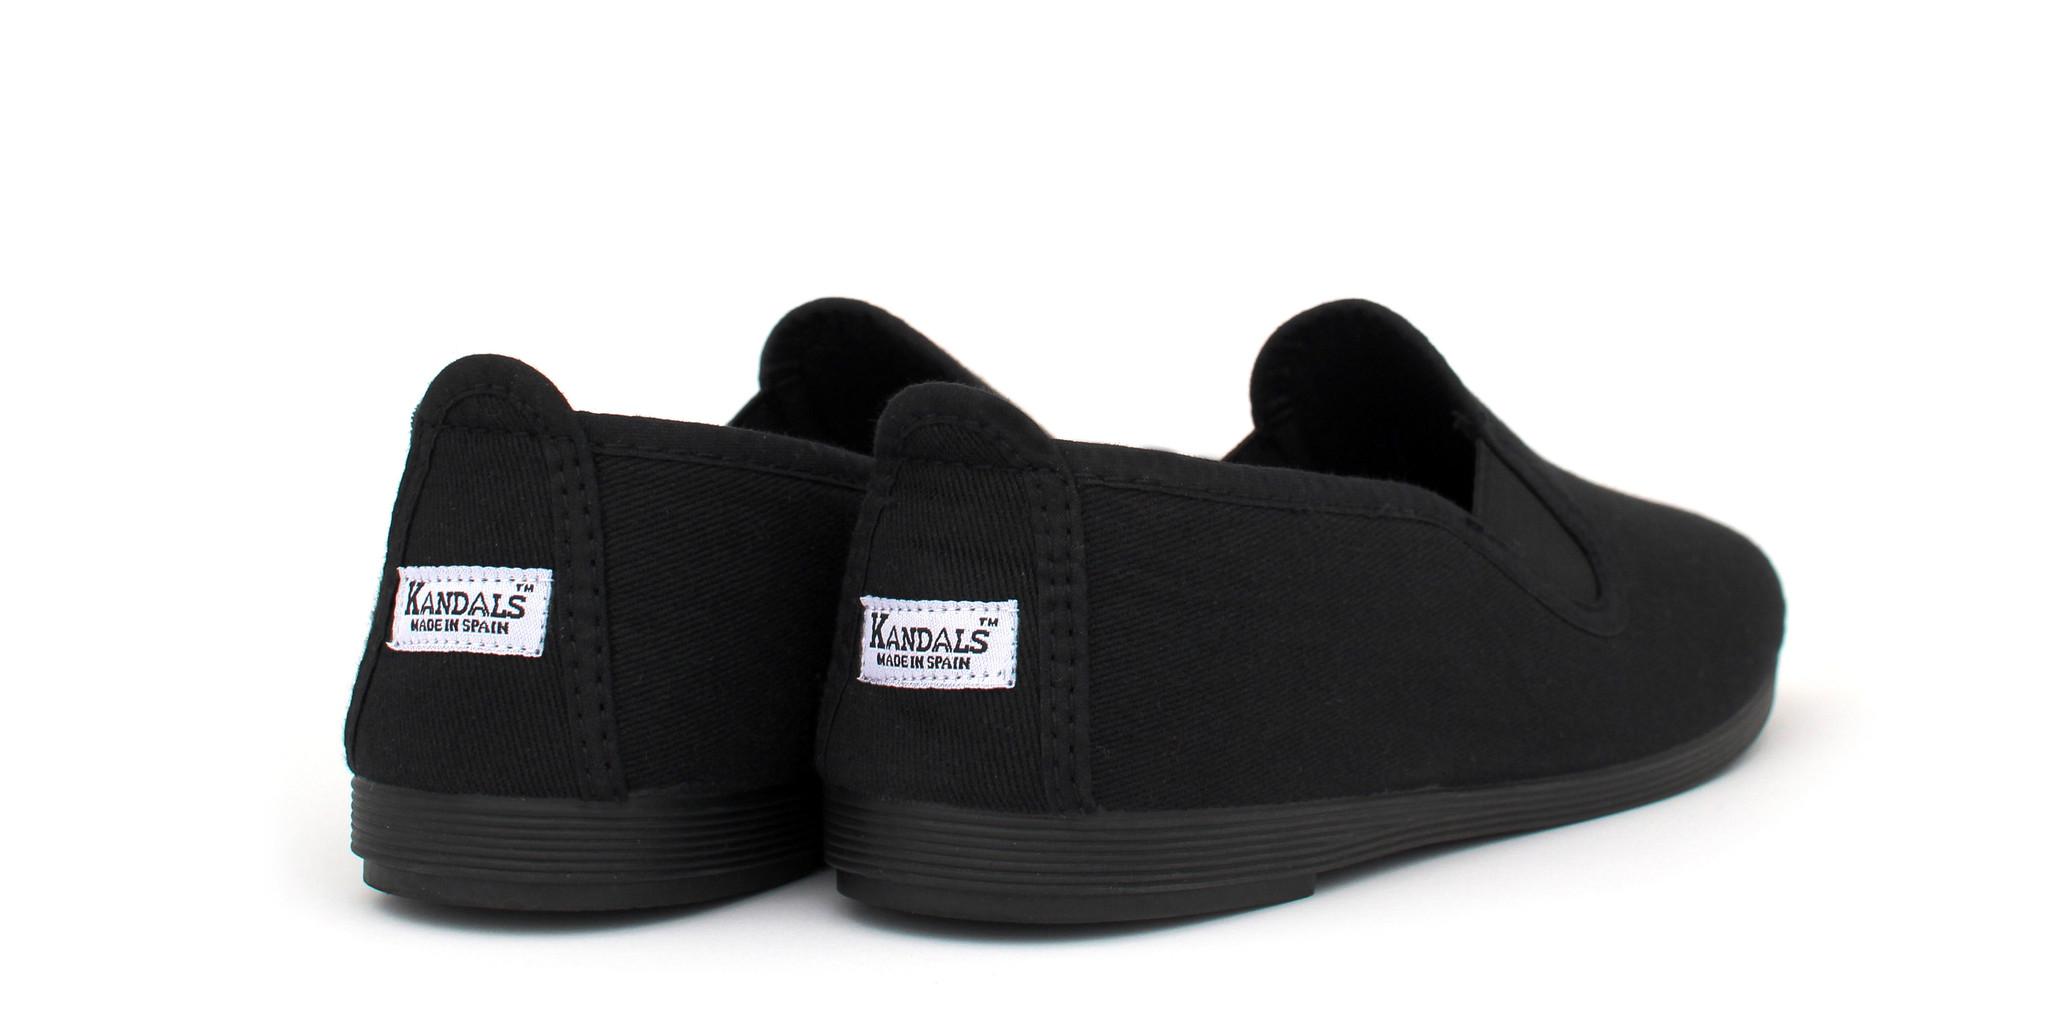 all black shoes ... kandals vegan shoes - eco all black ... NOZUCCQ